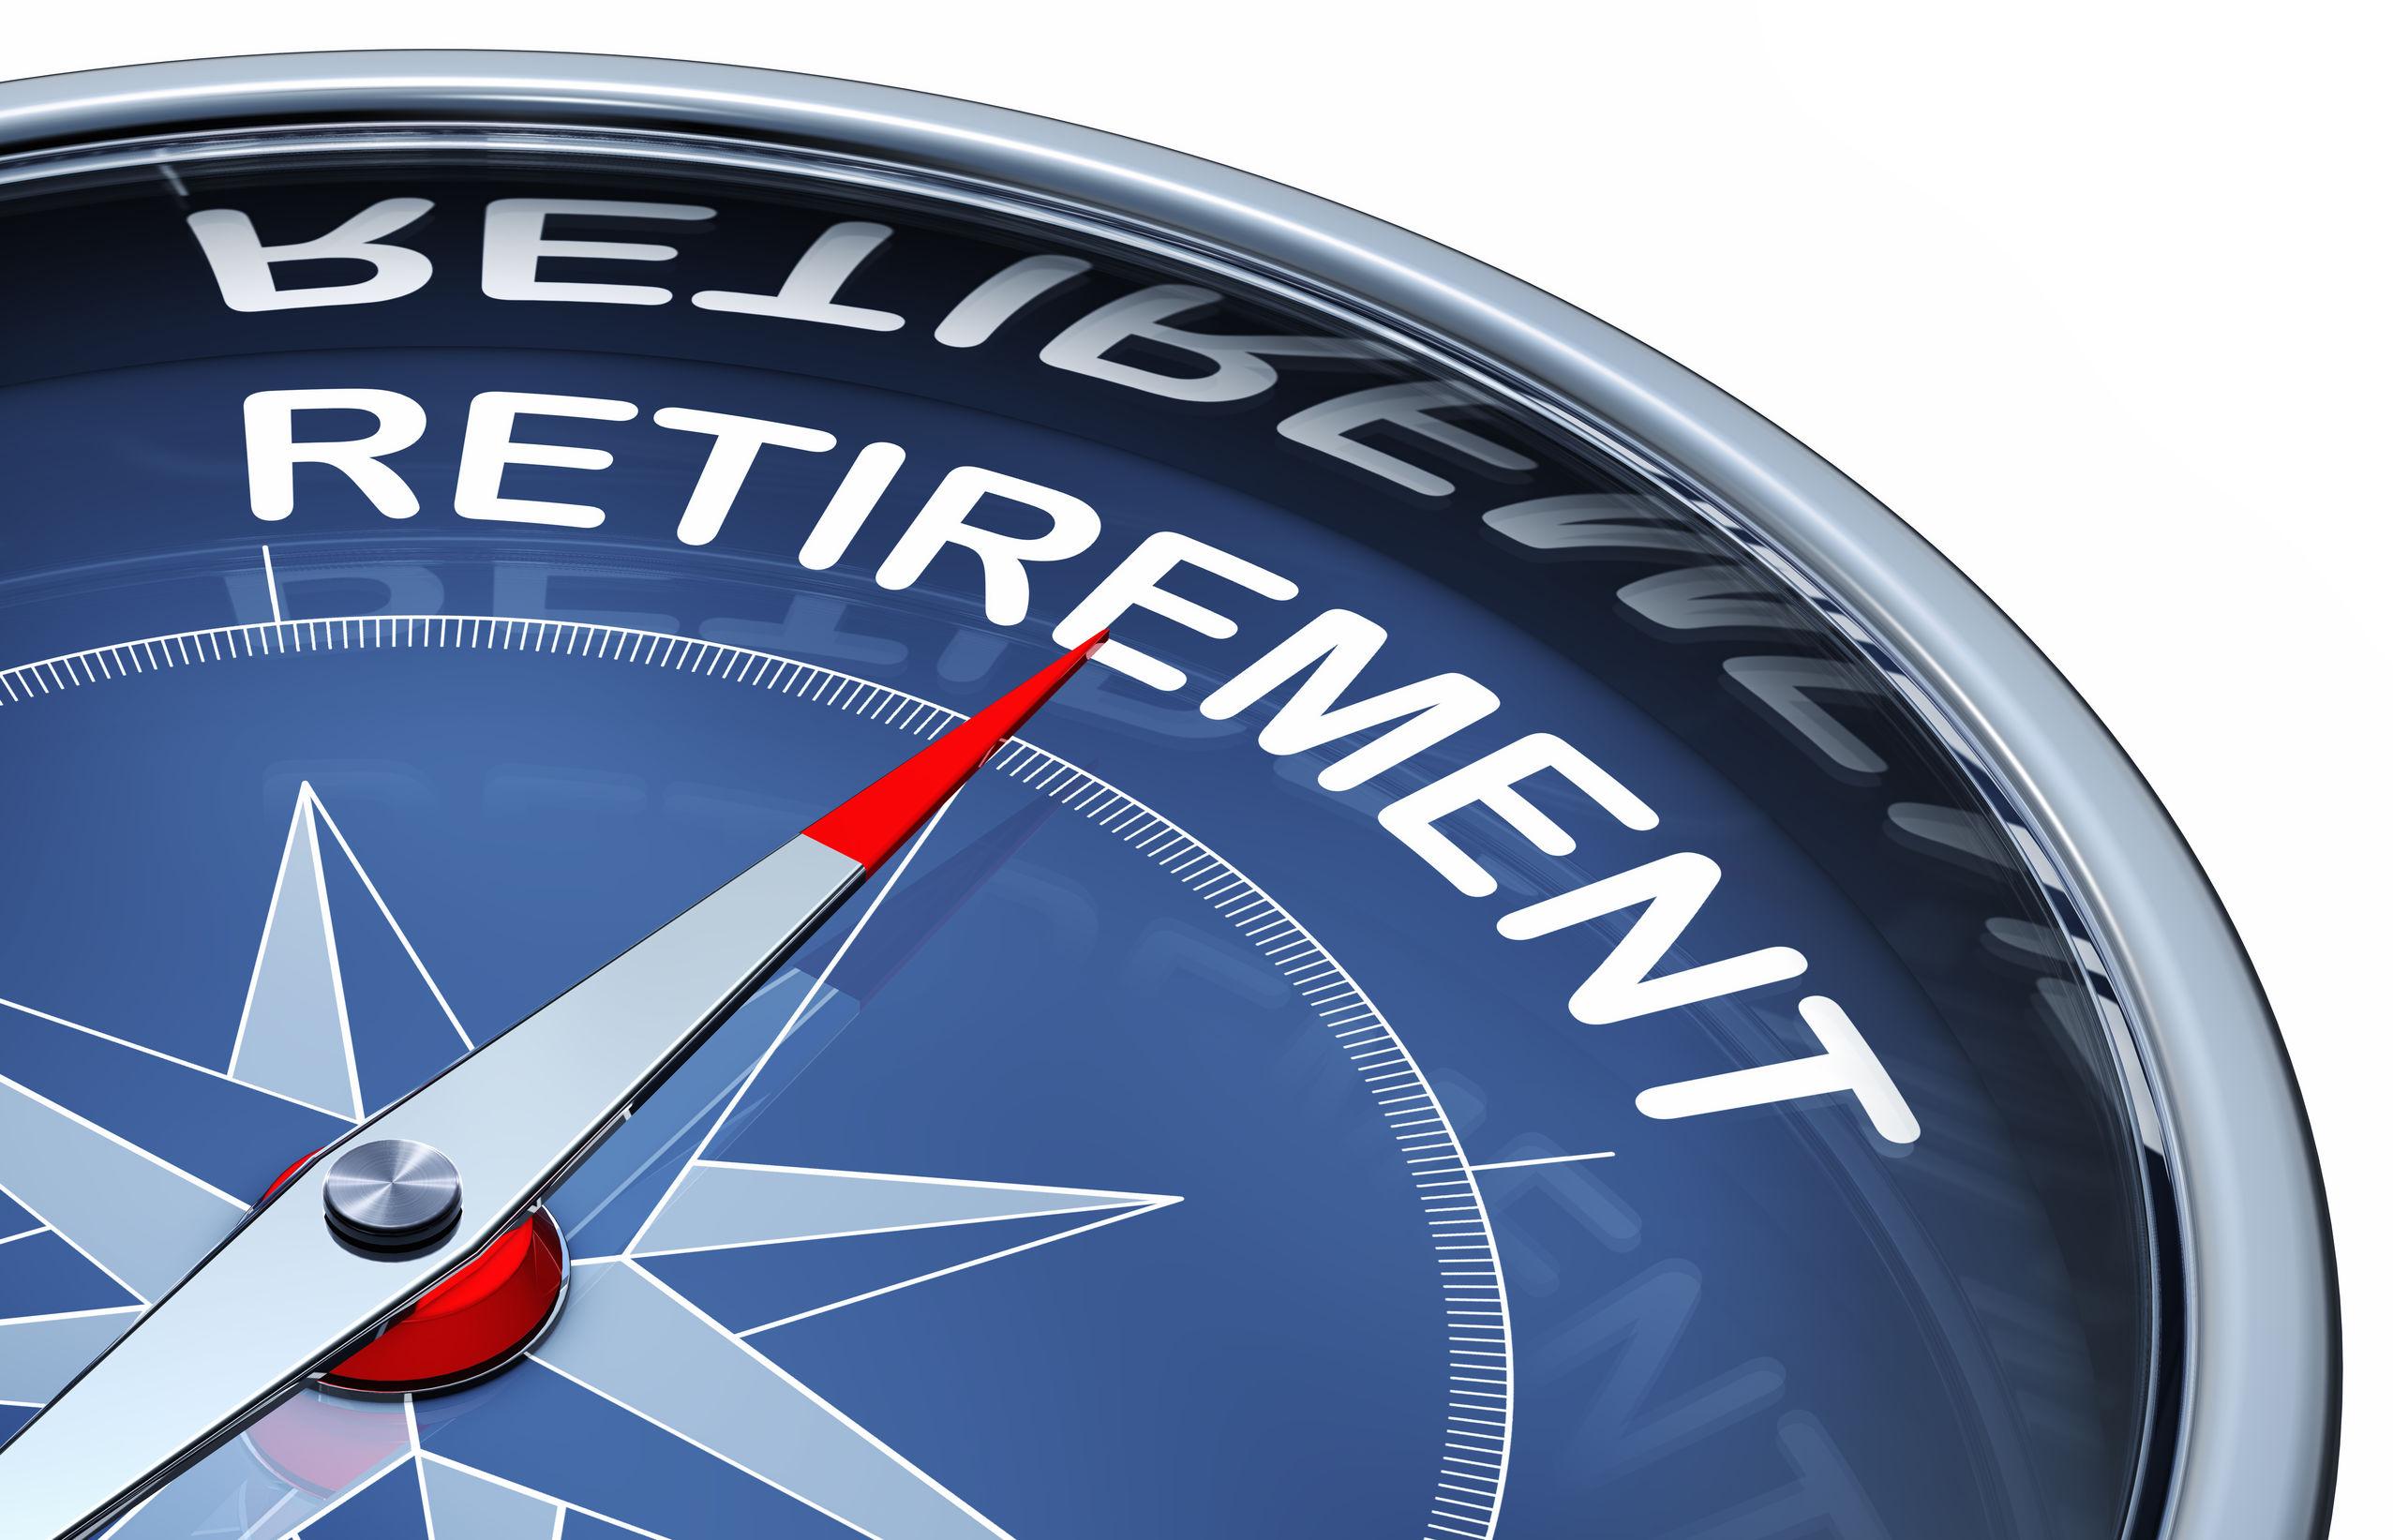 Retiring Amidst COVID-19 Crisis